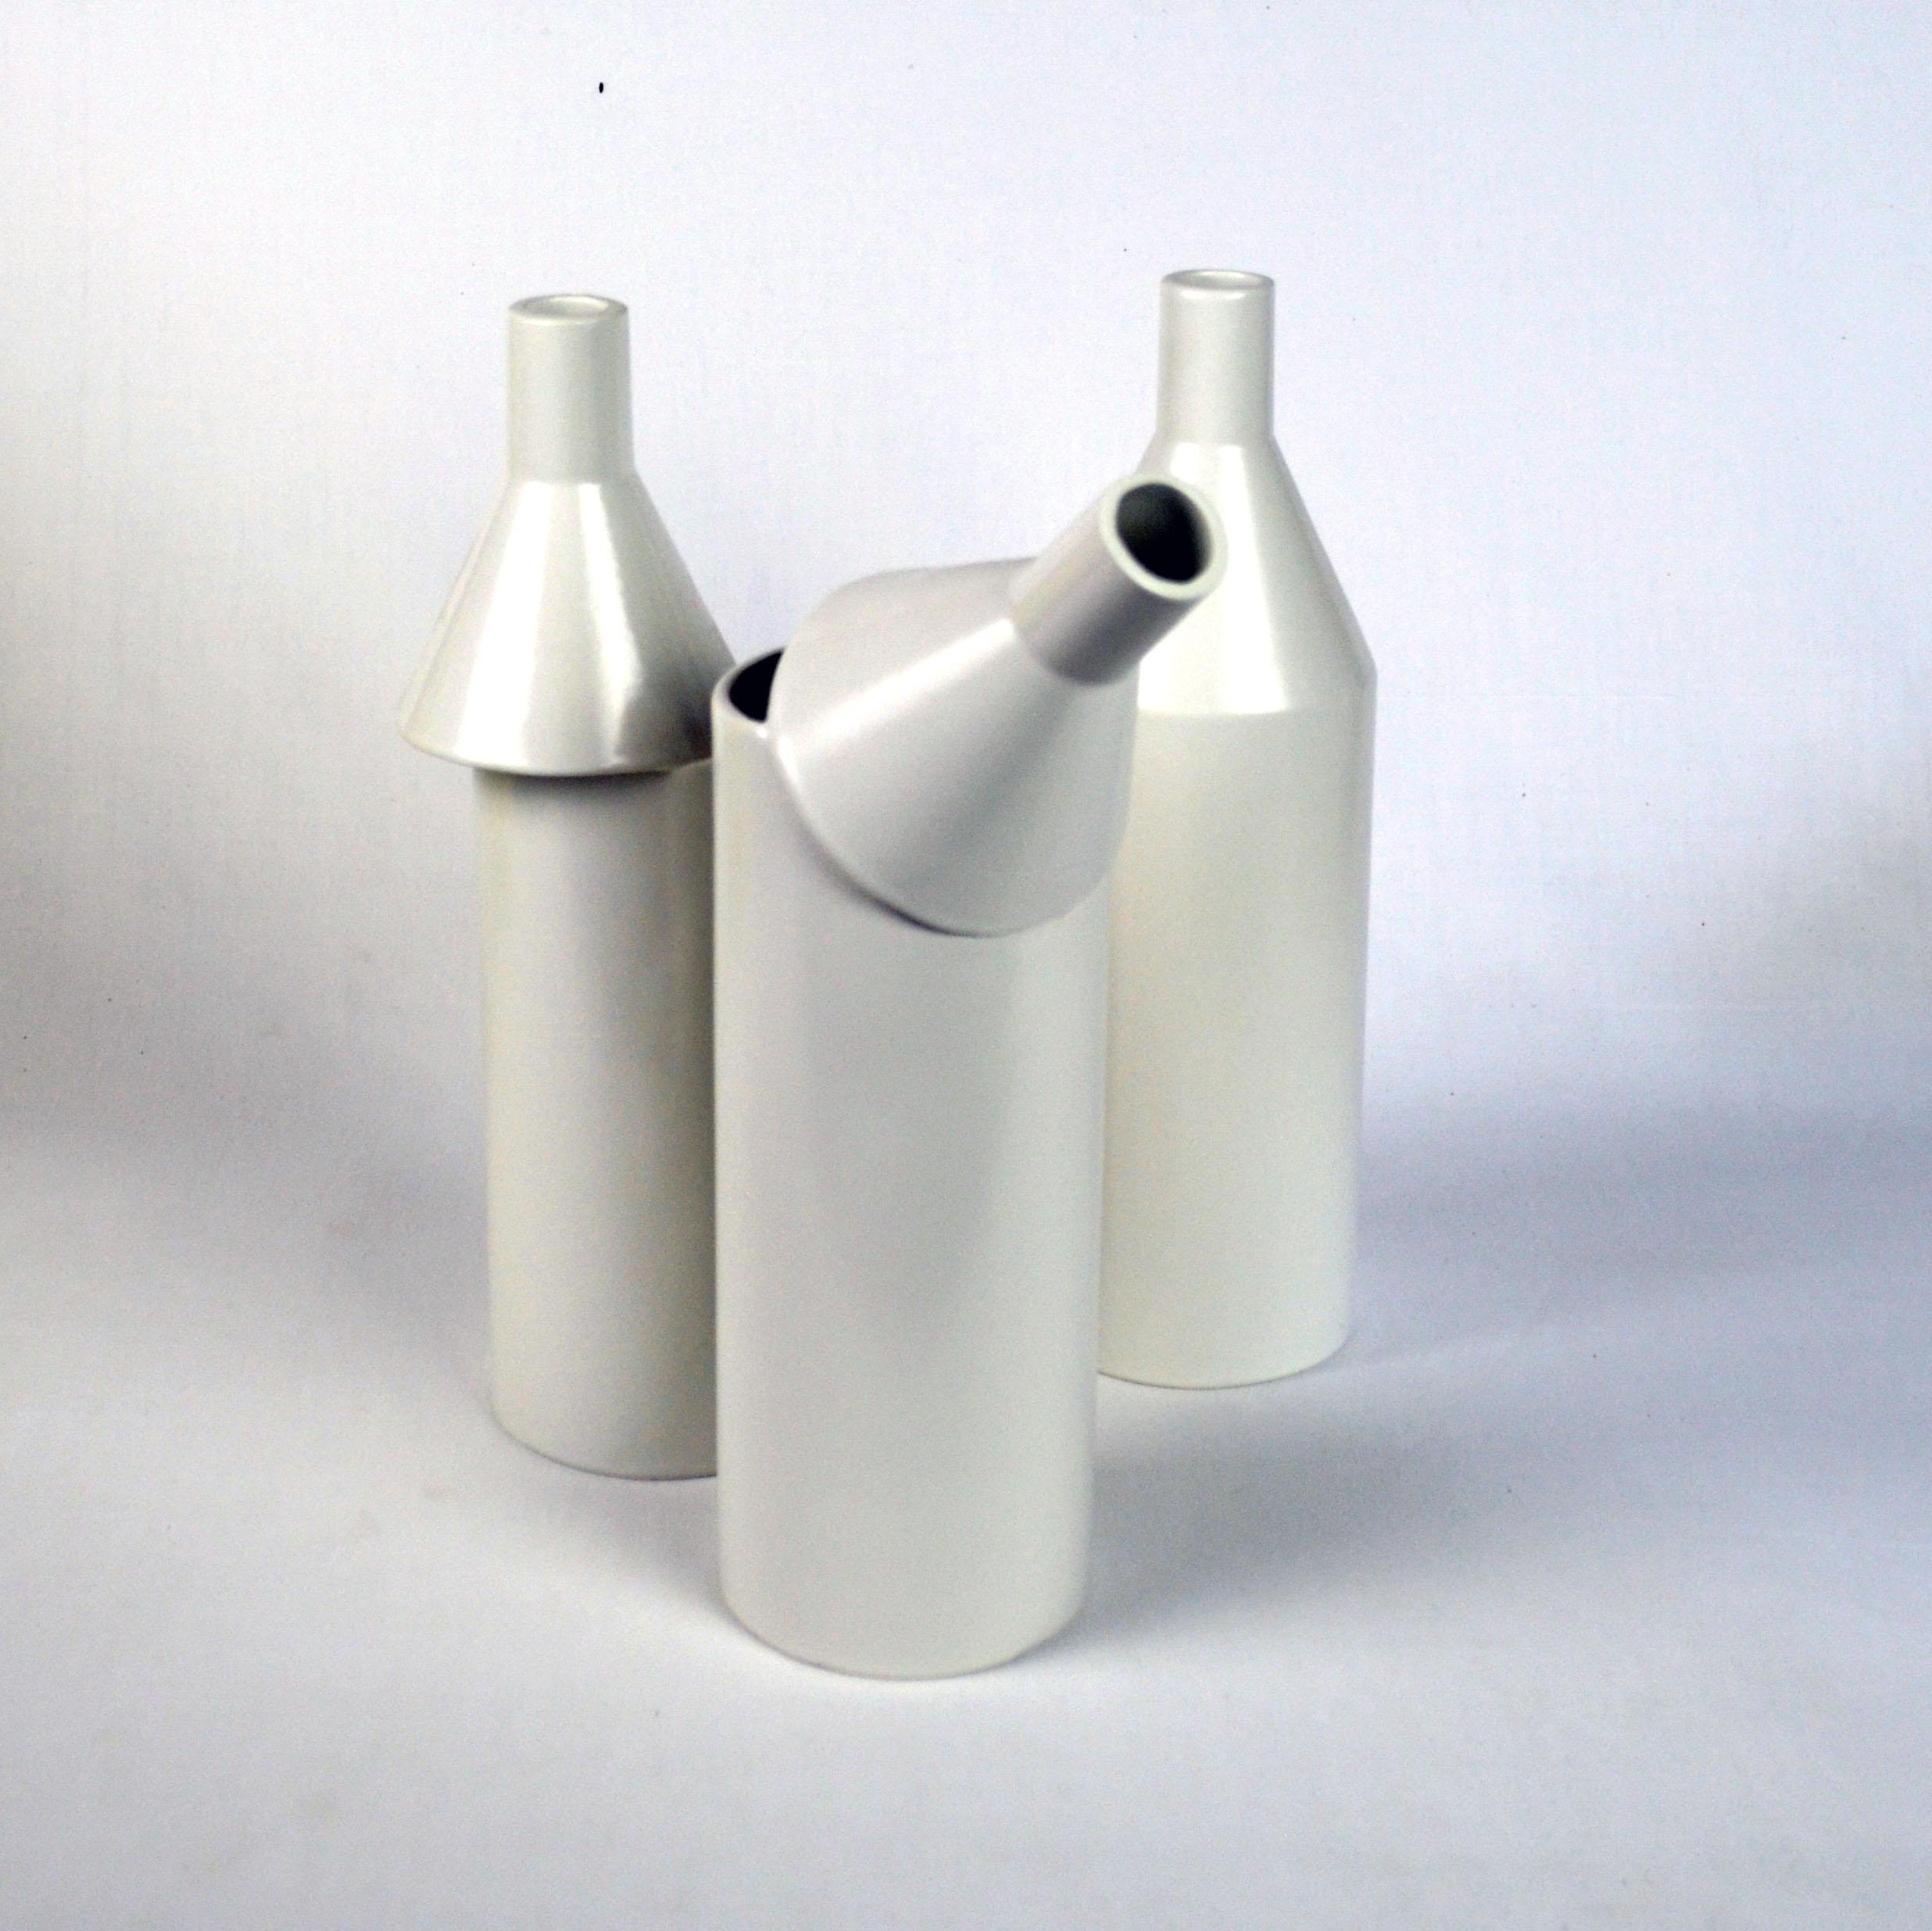 carafe-design-céramique-émail-denis-castaing